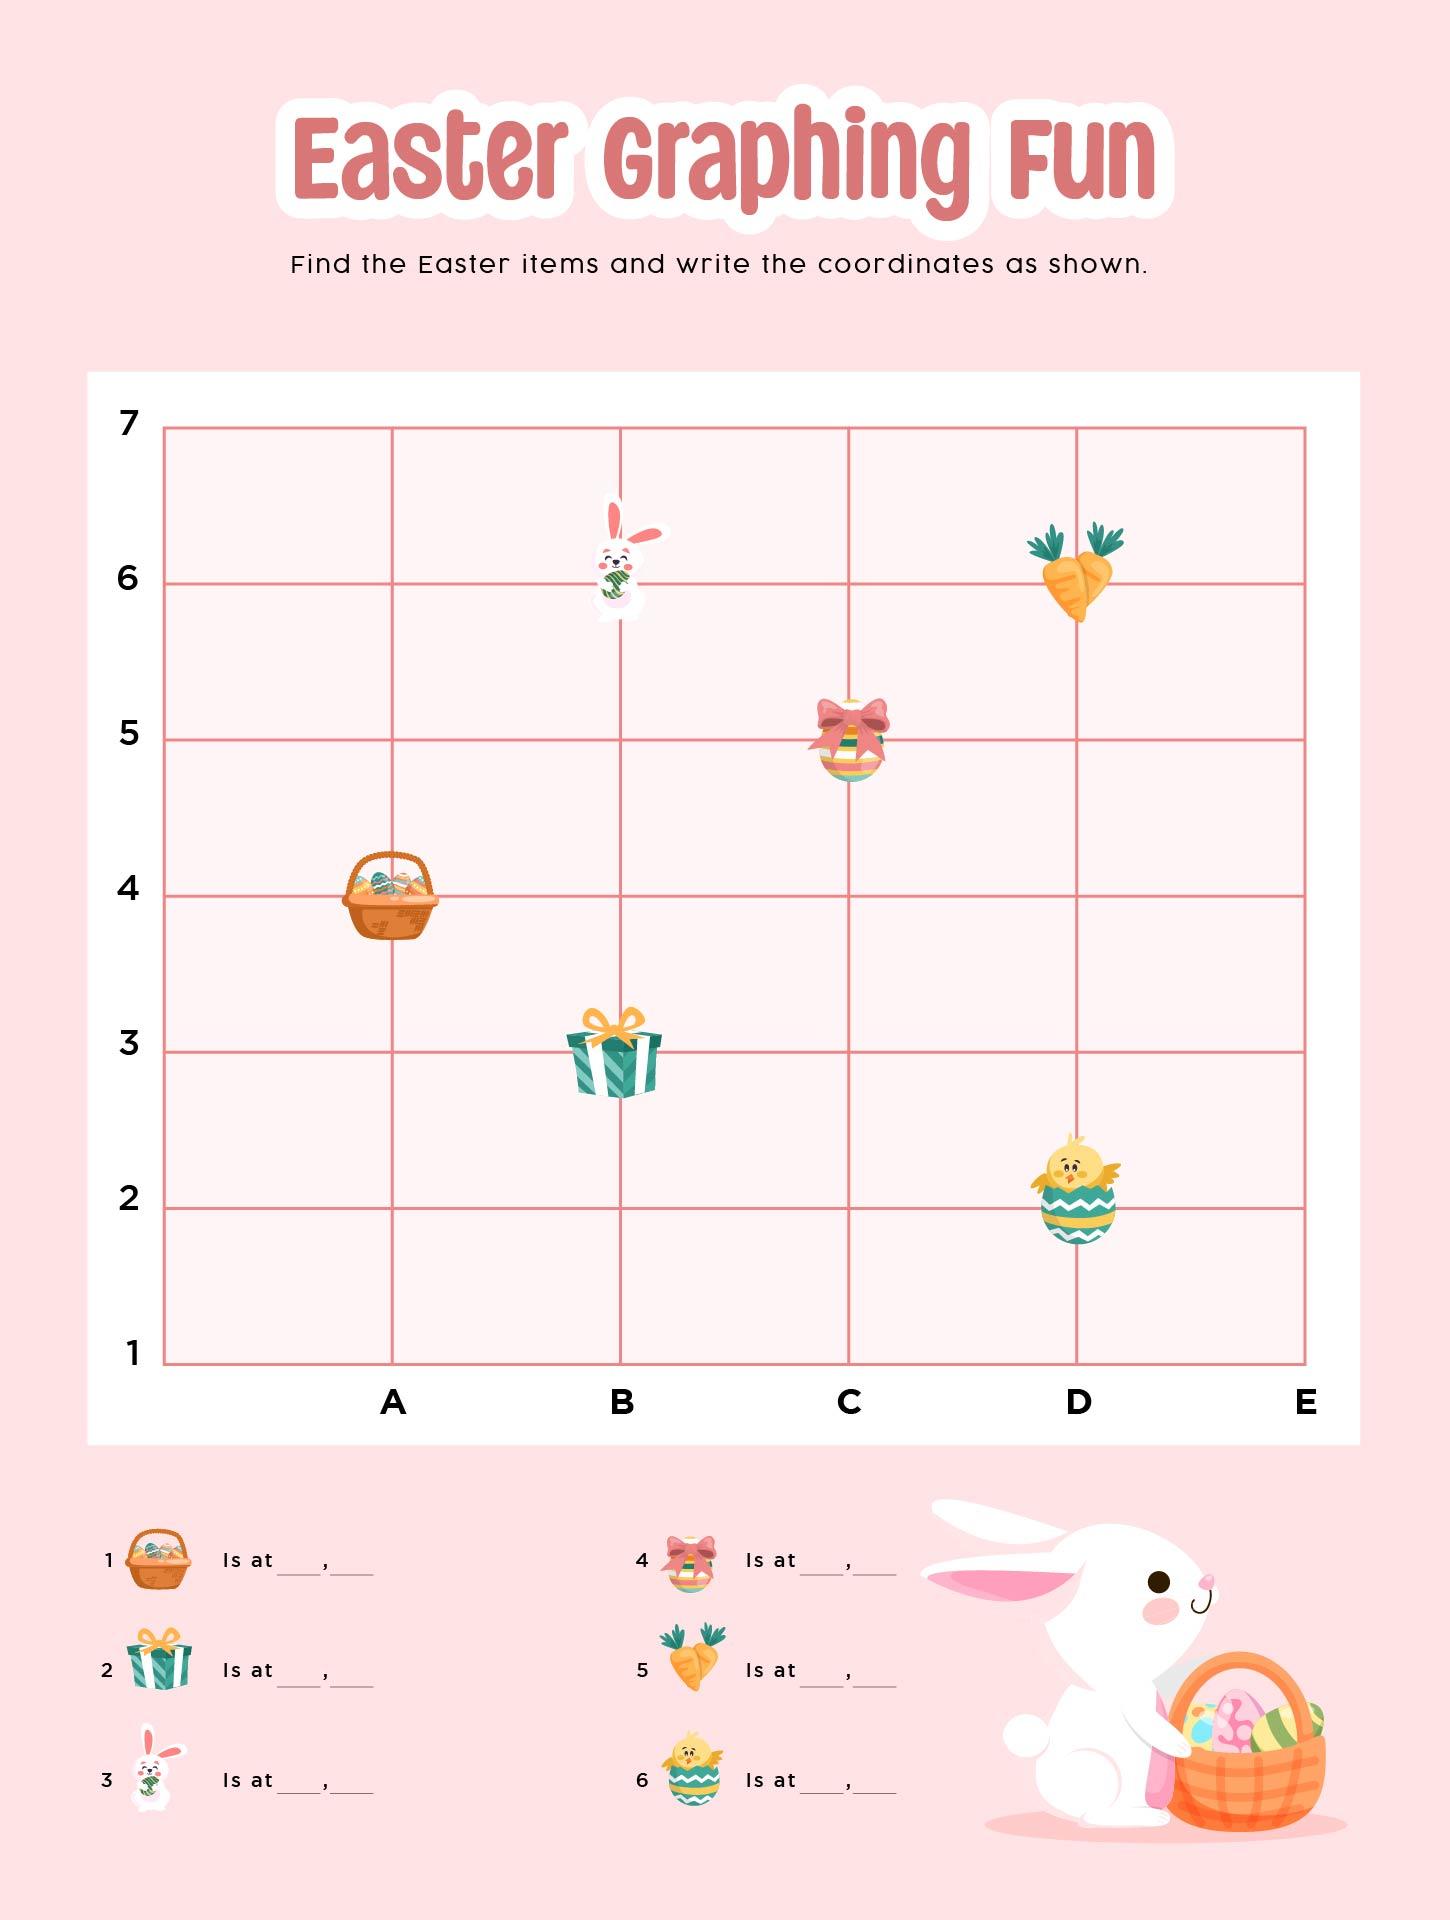 Number Names Worksheets kindergarten graphing worksheets : 8 Best Images of Kindergarten Graphing Worksheets Printable Easter ...